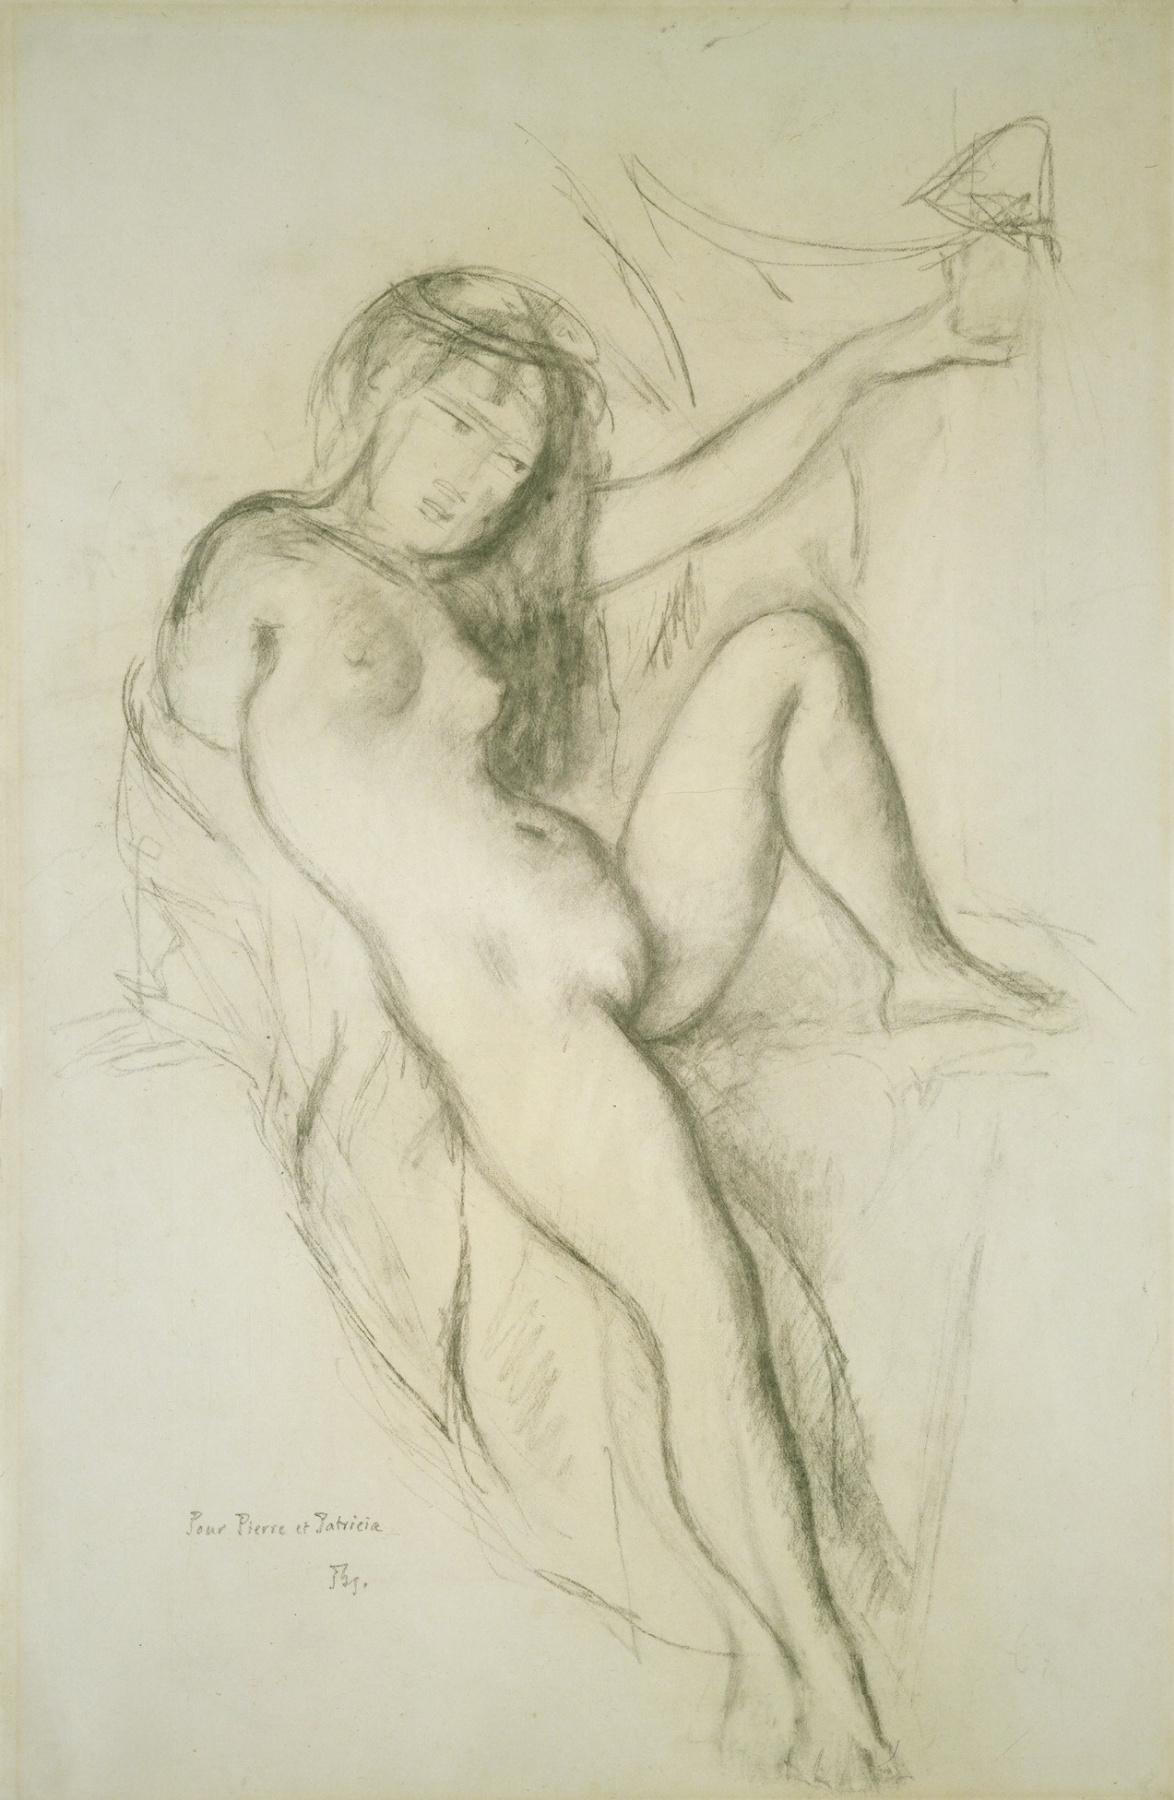 Balthus (Balthasar Klossovsky de Rola). Seated nude